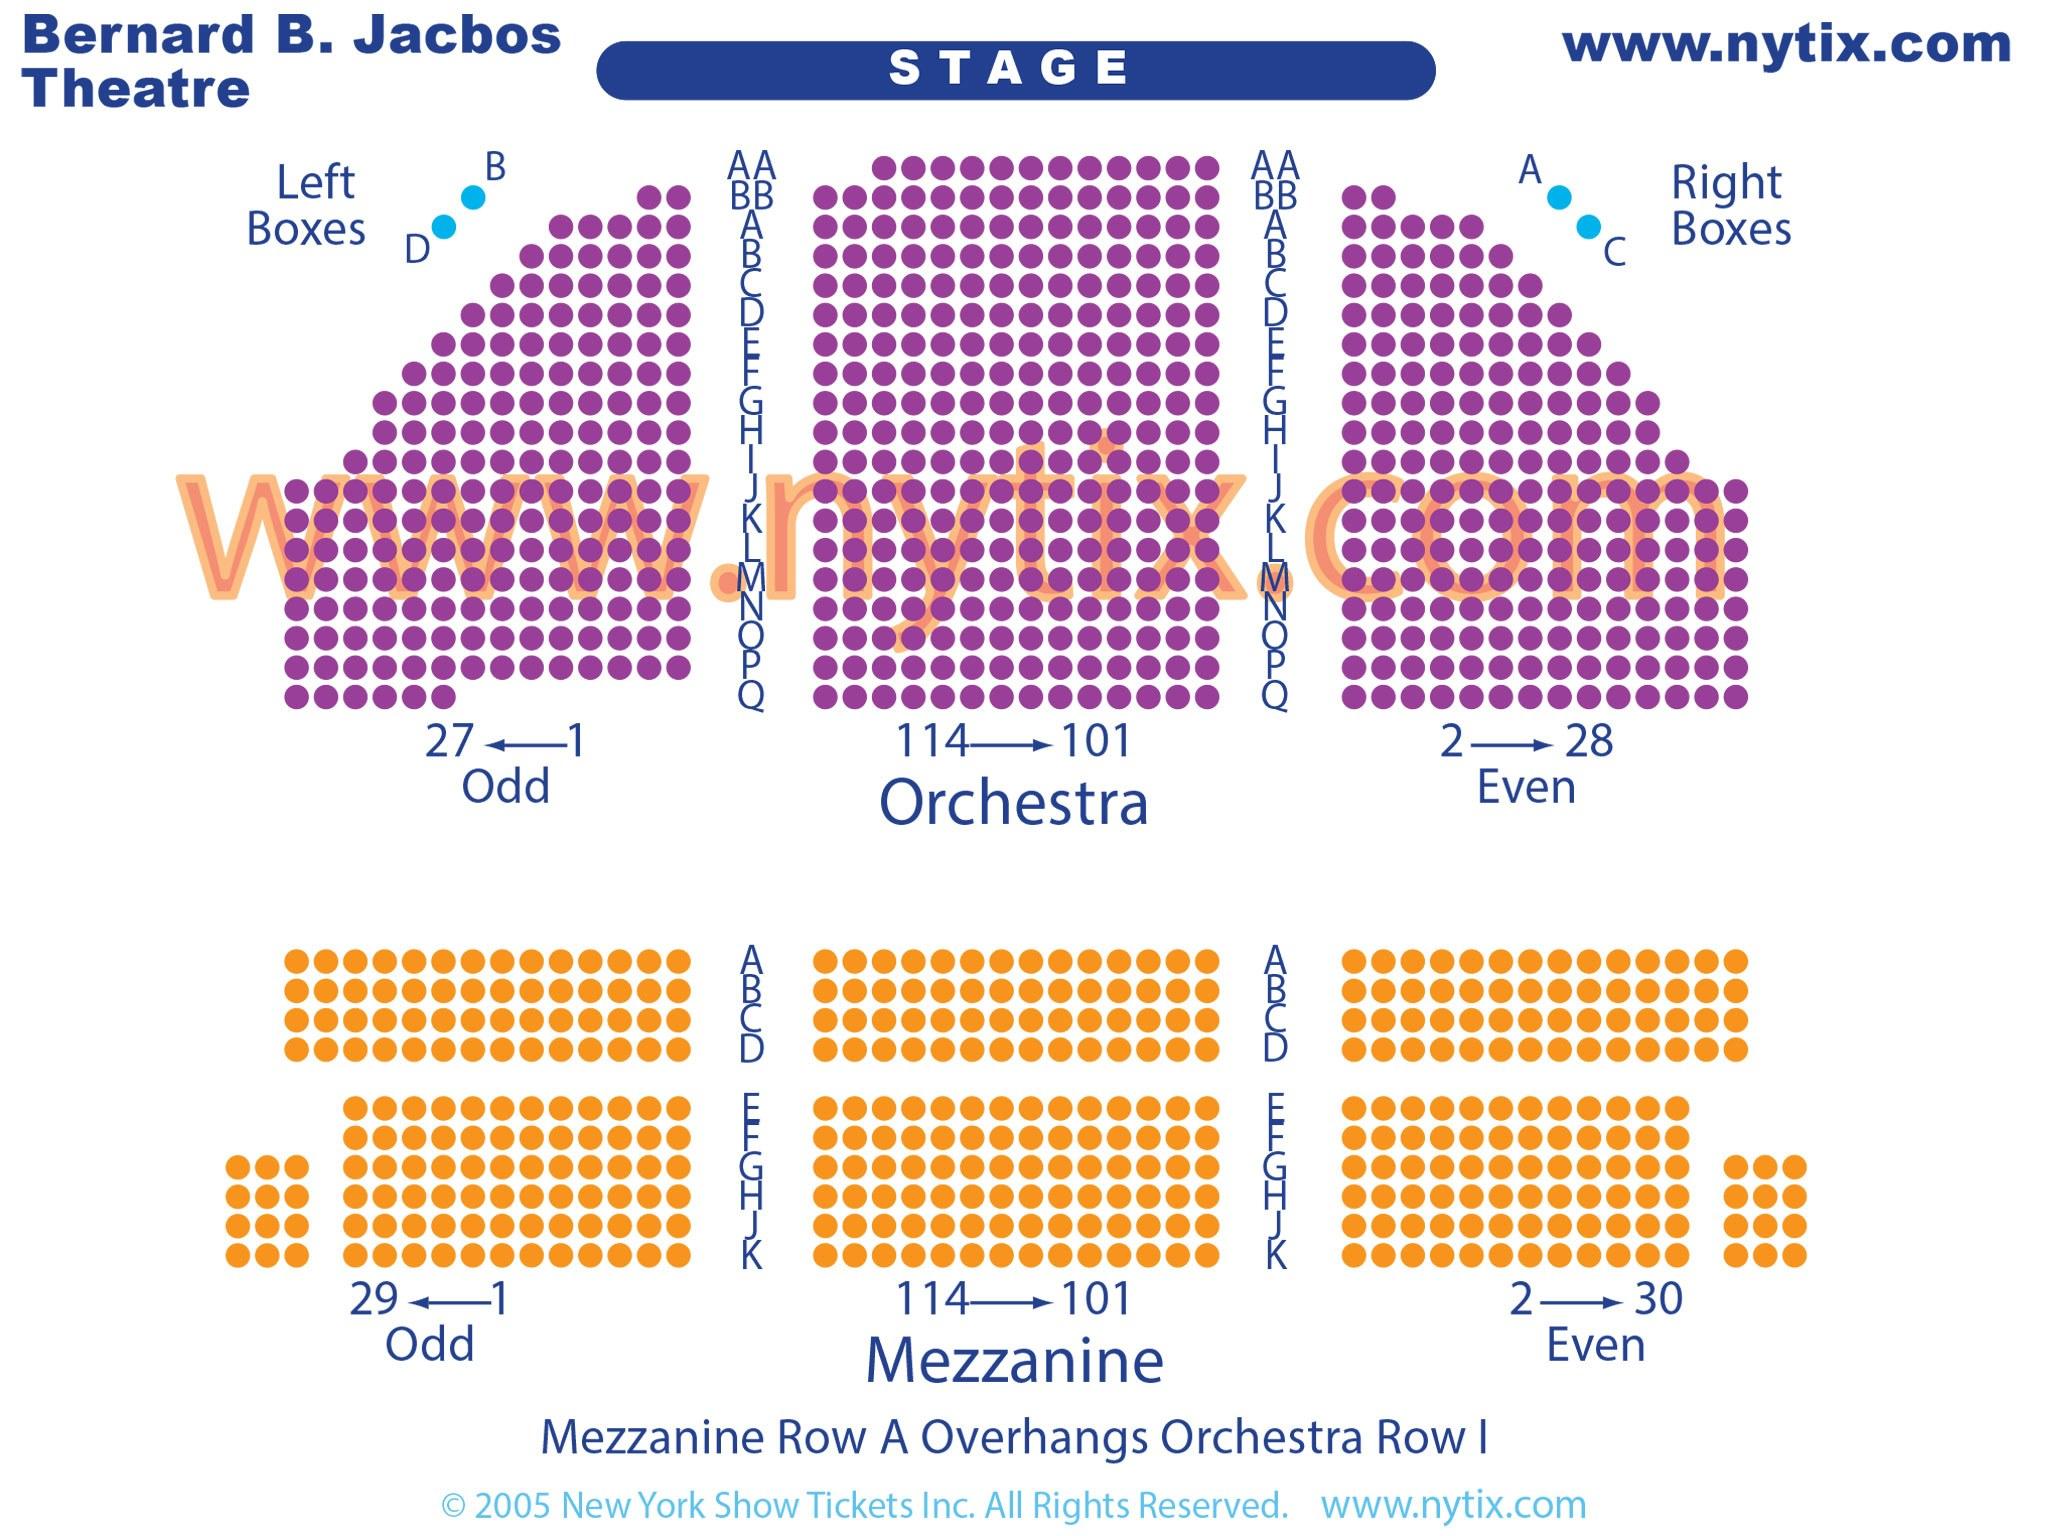 Bernard B Jacobs Theatre Seating Chart